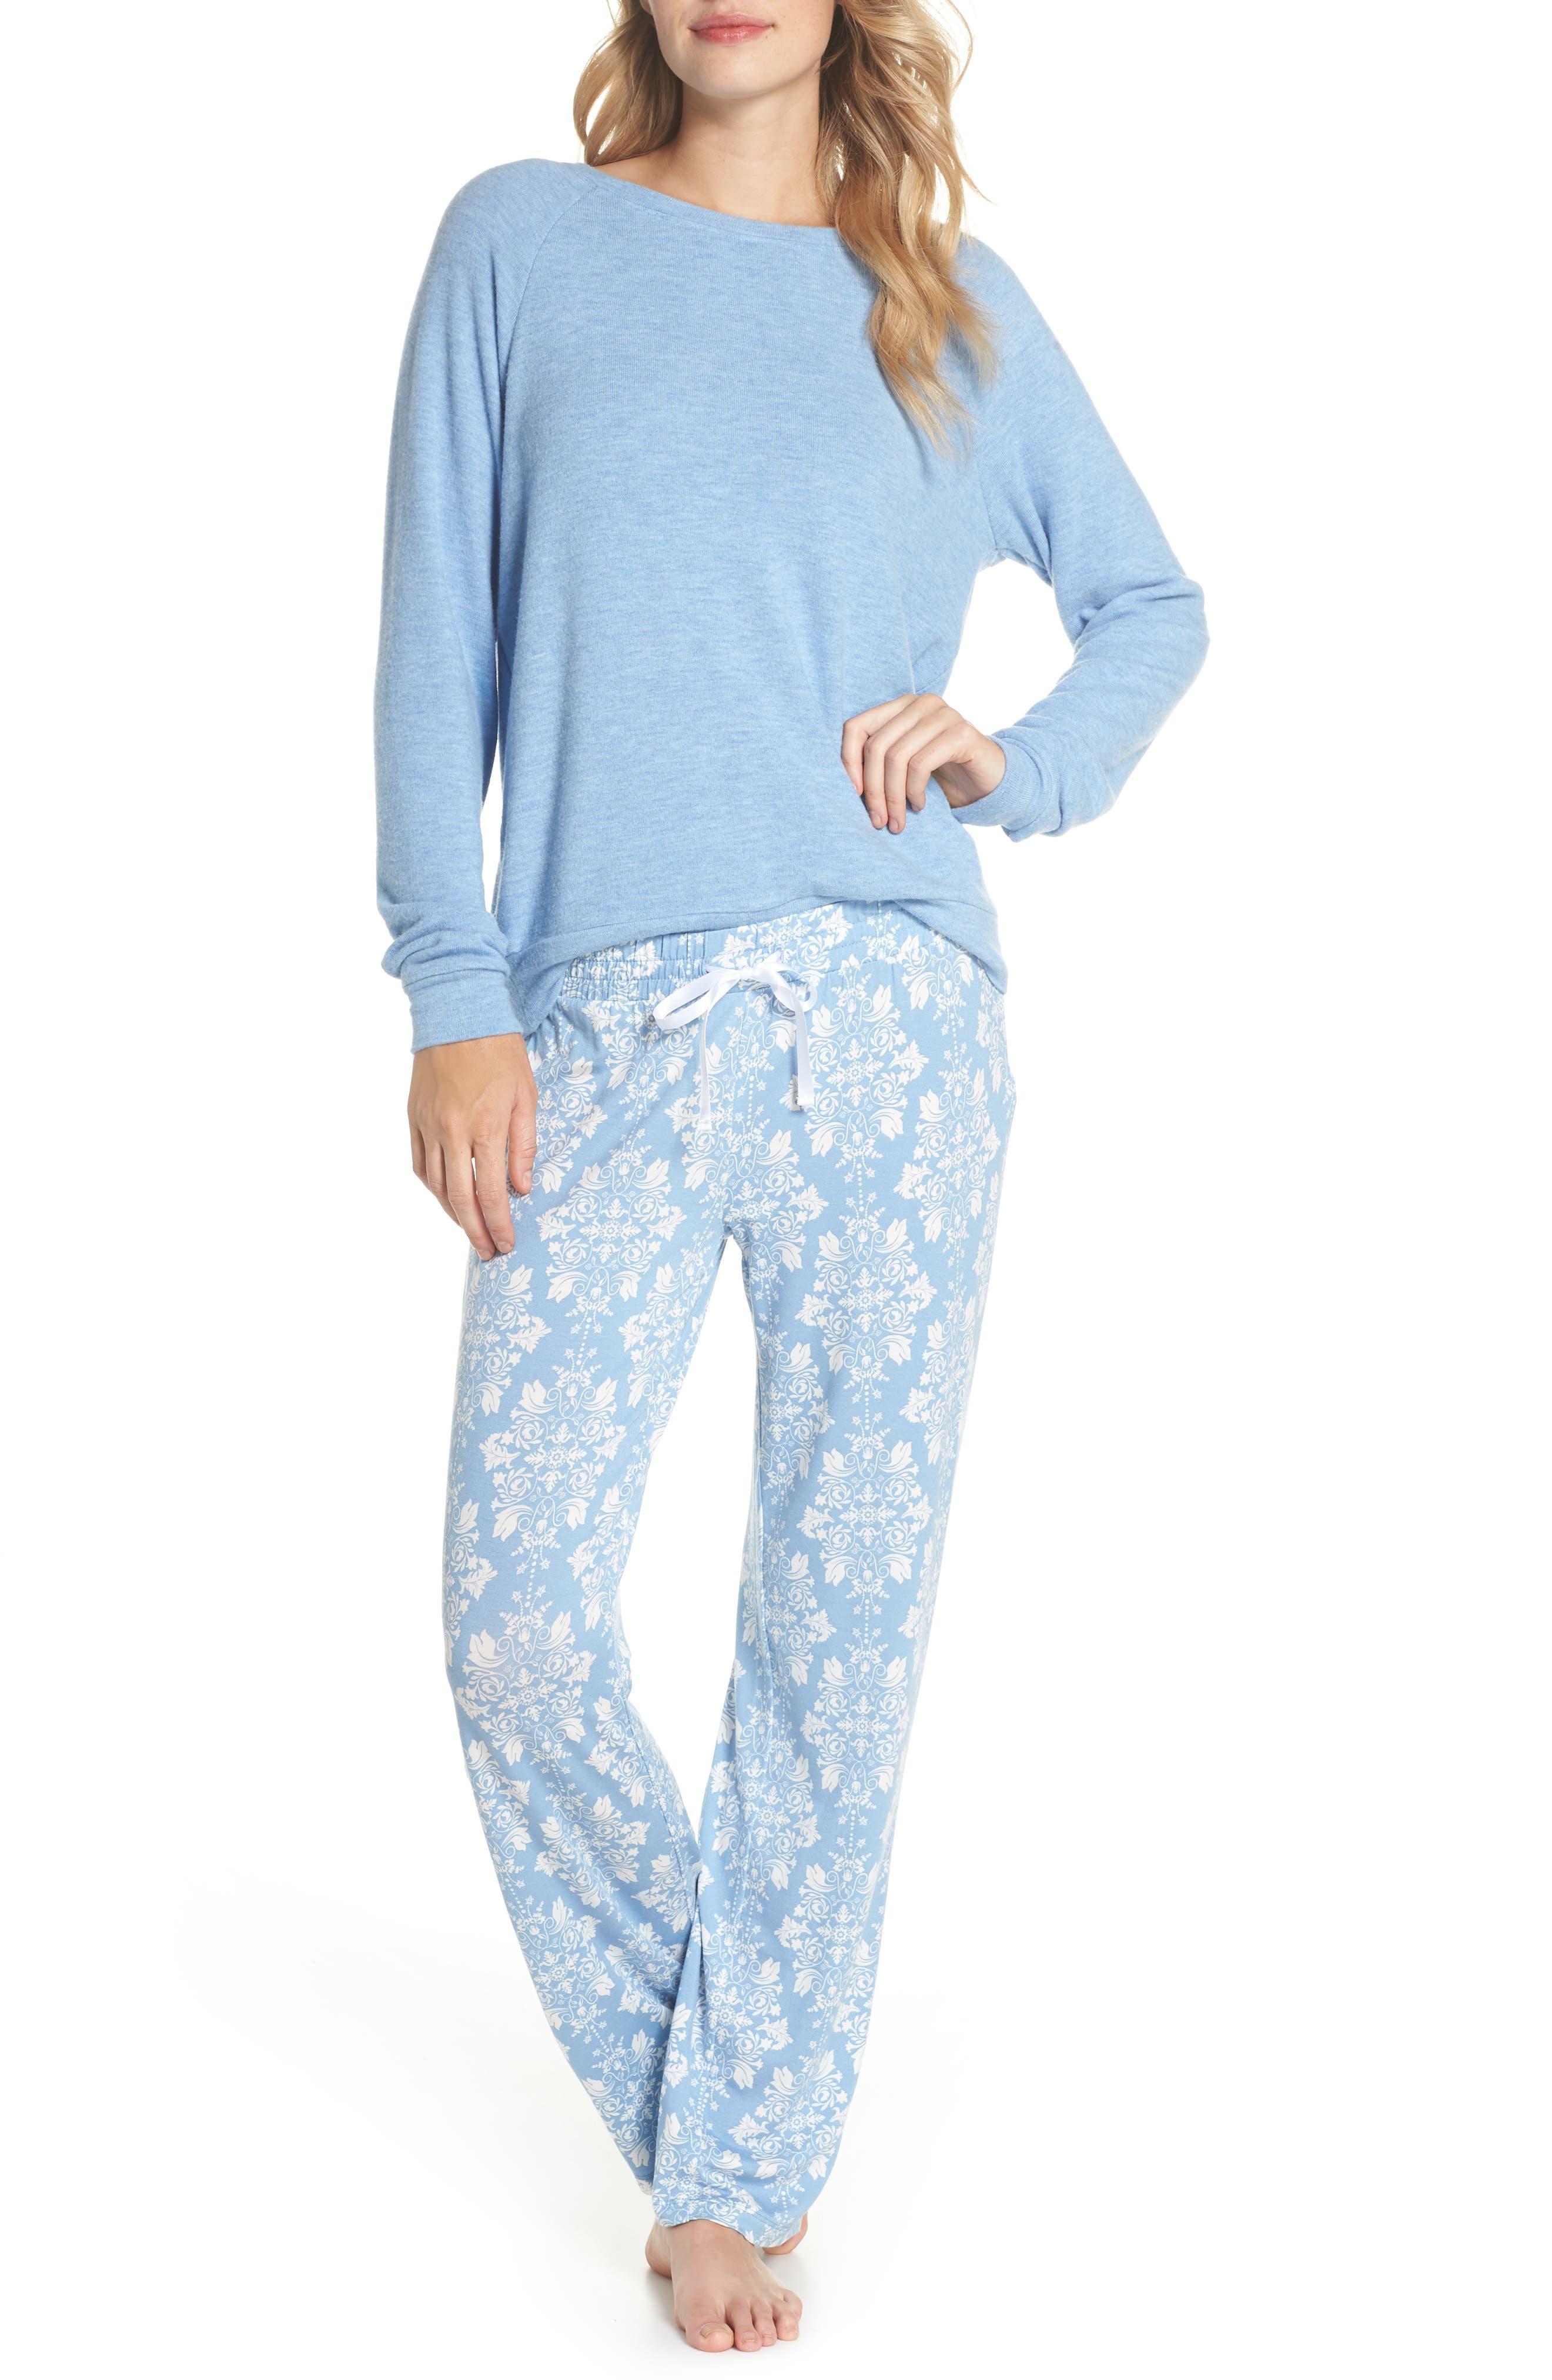 Peachy Pajama Shirt,                             Alternate thumbnail 5, color,                             Blue